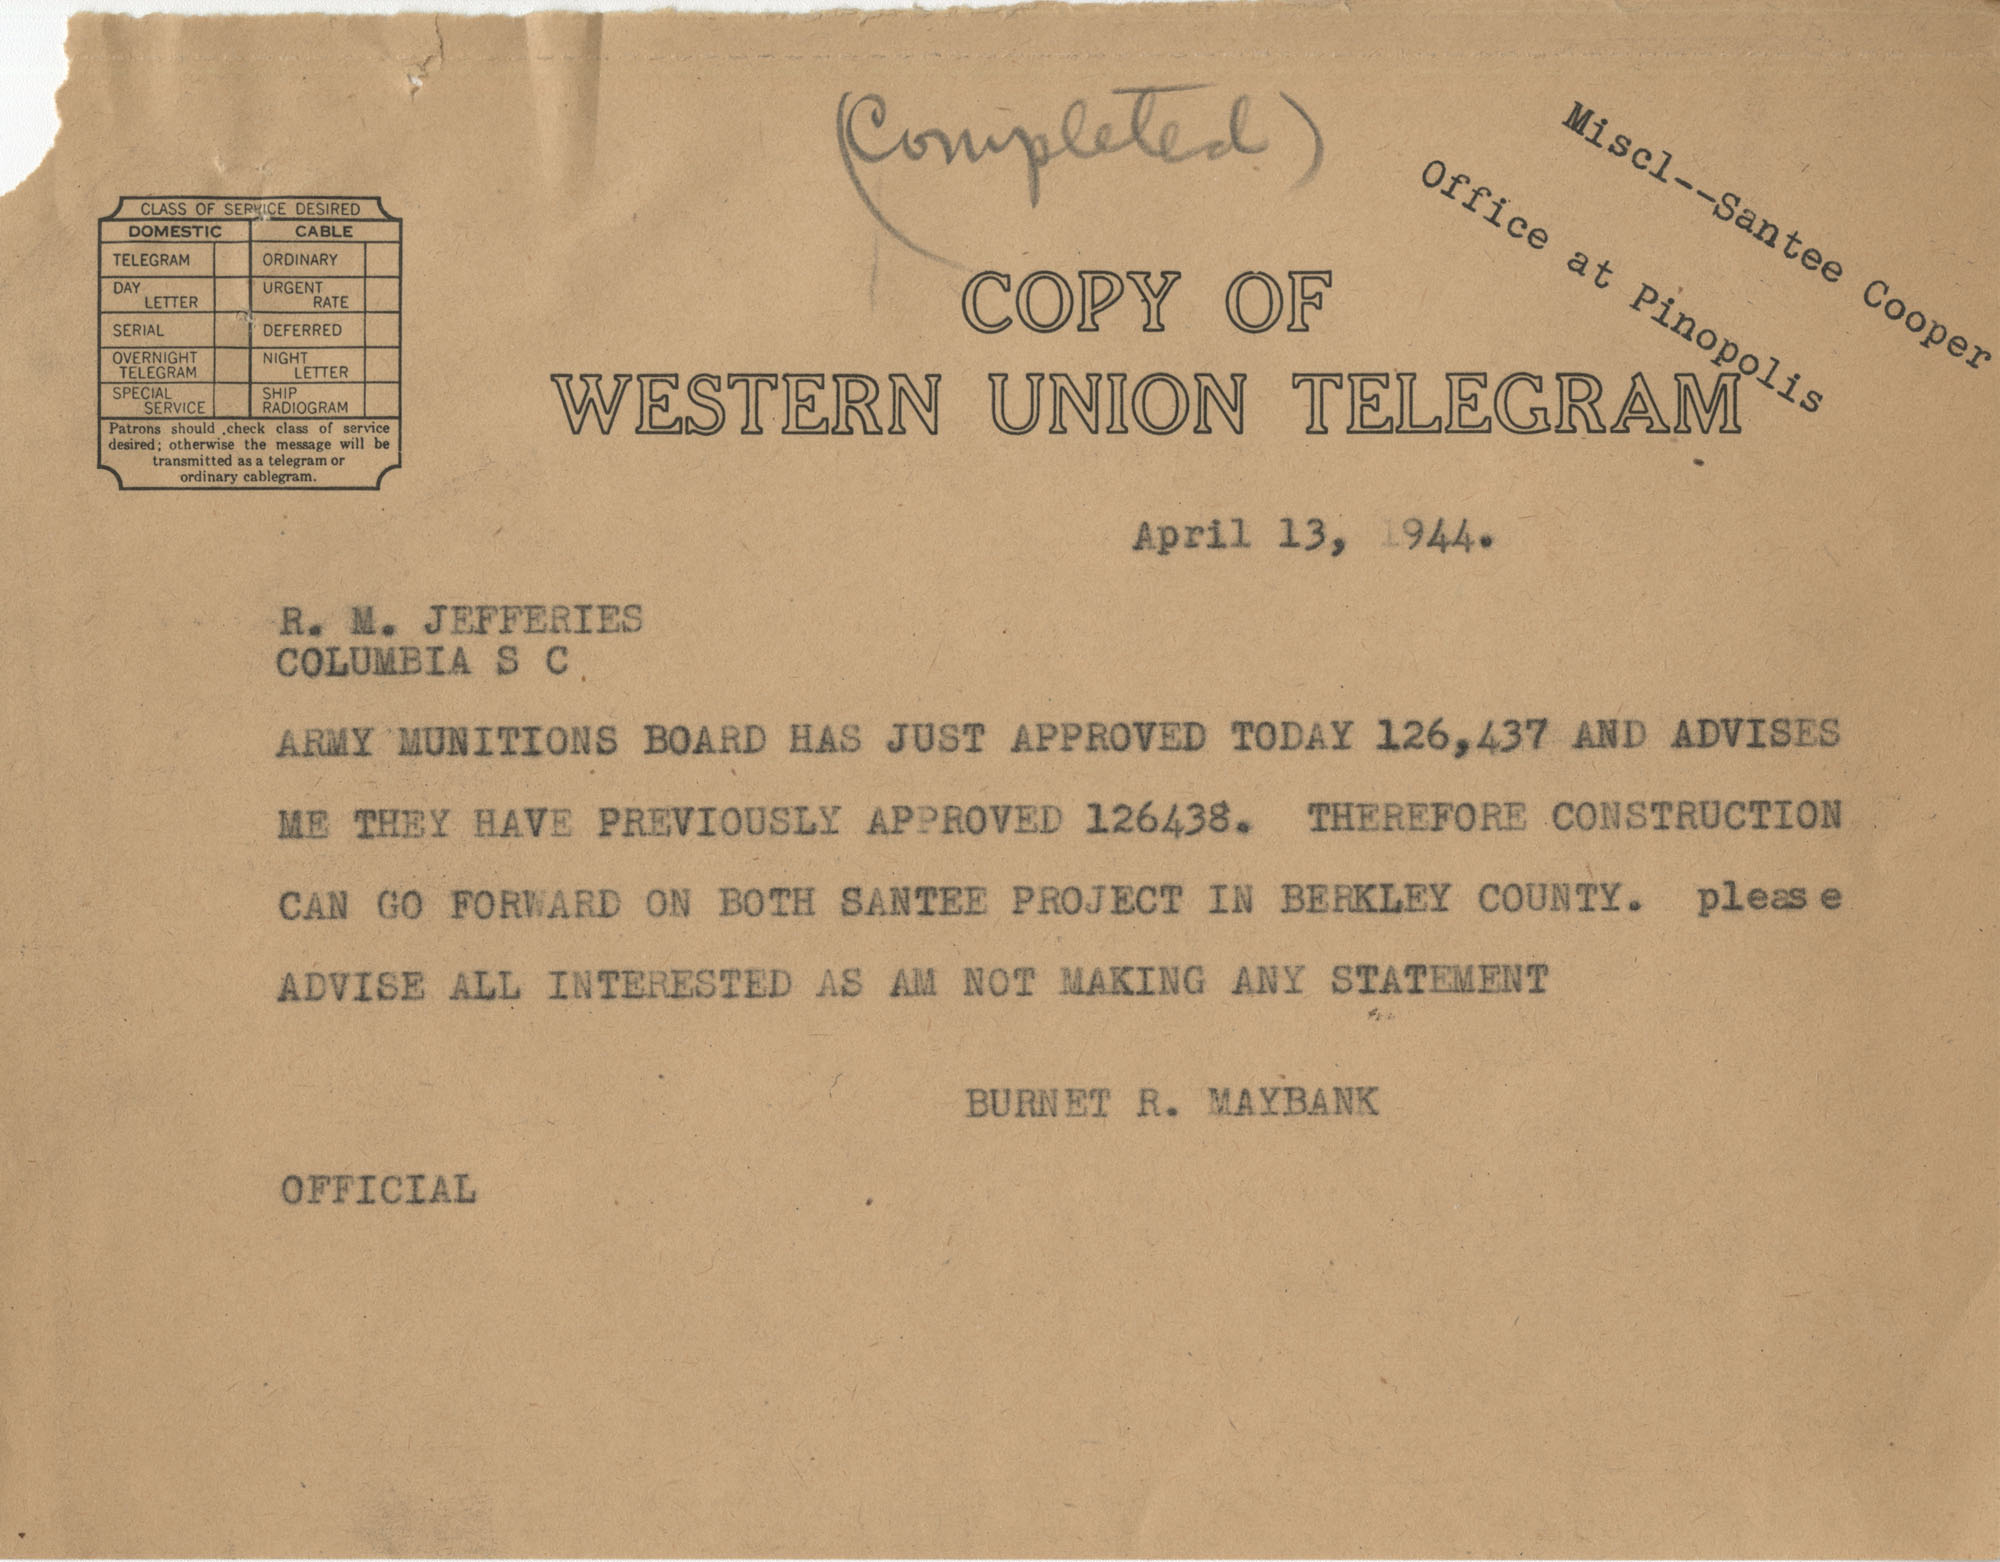 Santee-Cooper: Telegram from Senator Burnet R. Maybank to Richard M. Jefferies (General Counsel of the South Carolina Public Service Authority), April 13, 1944